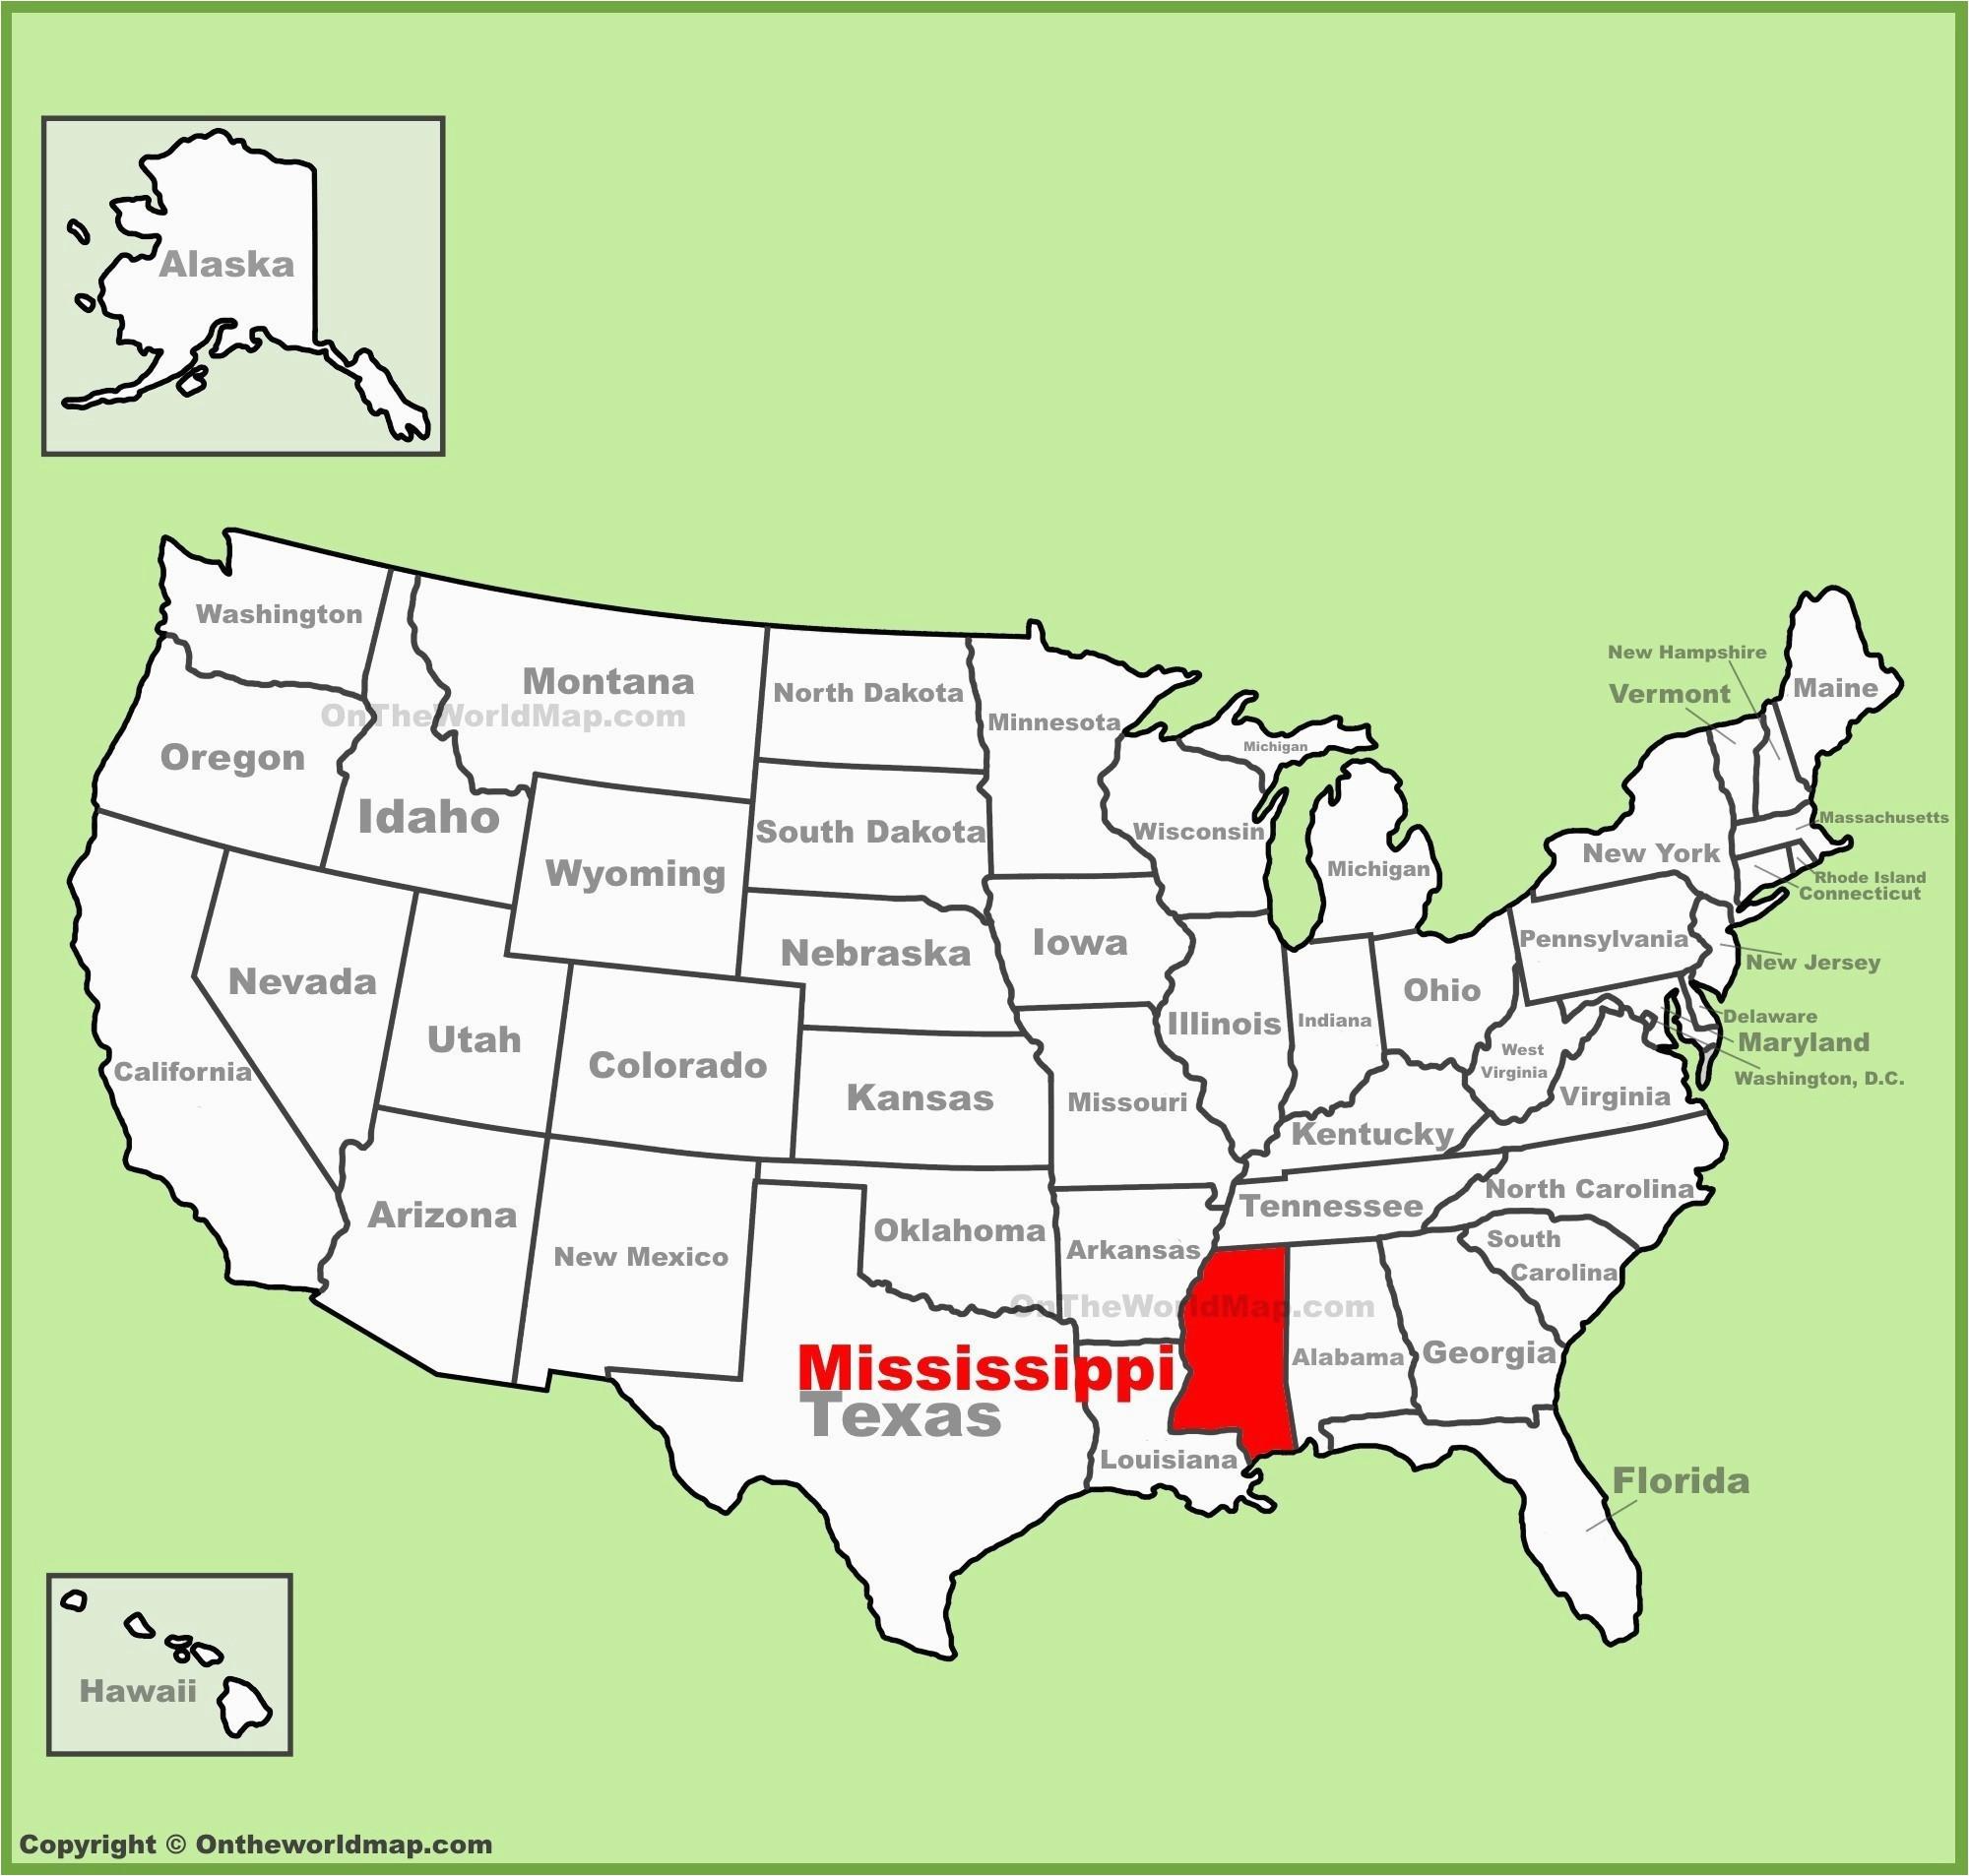 Show A Map Of north Carolina north Carolina United States Map Fresh United States Map Showing